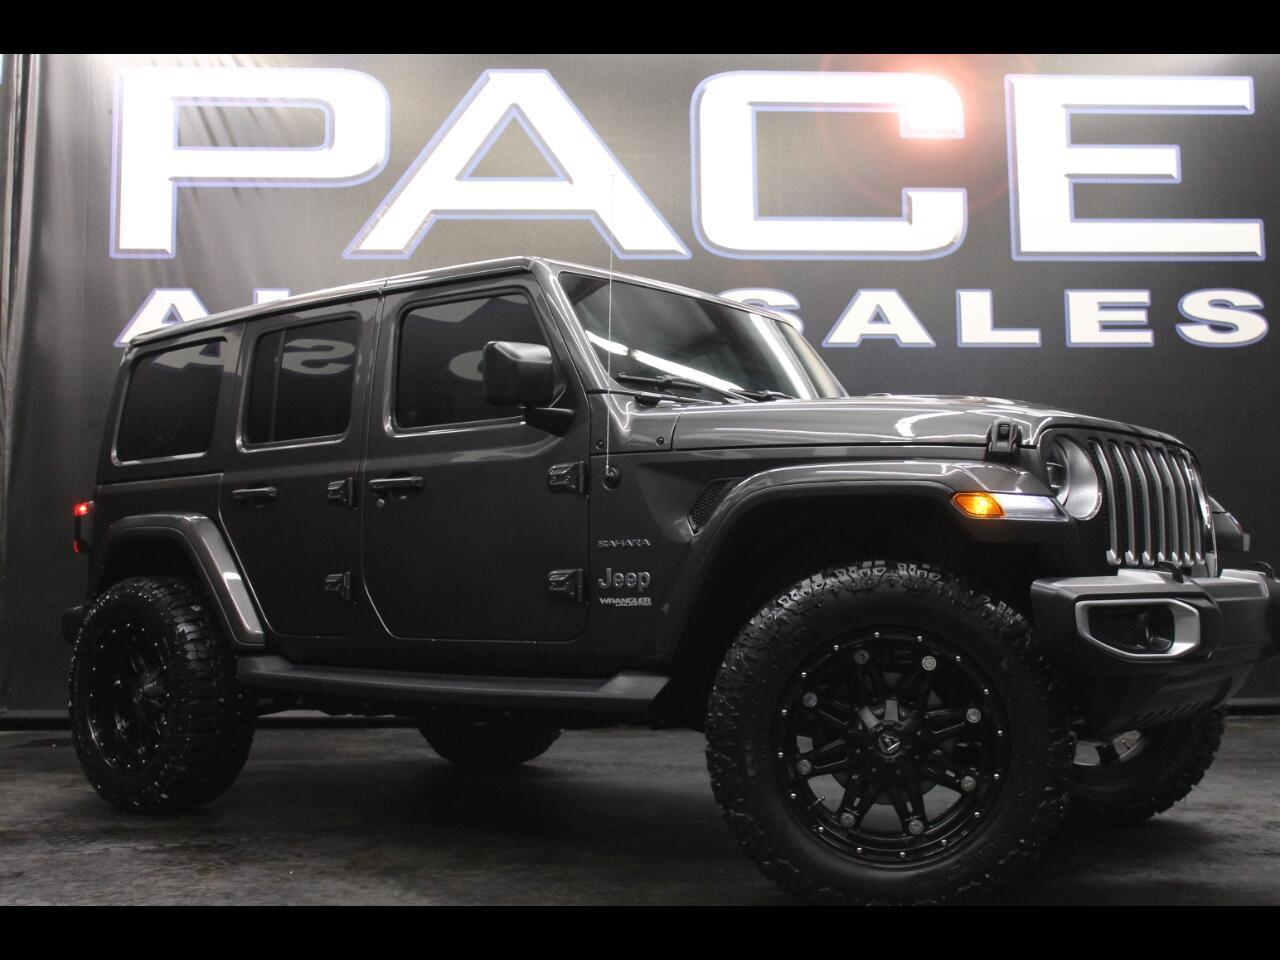 2018 Jeep Wrangler Unlimited Sahara 4x4 Lifted Custom